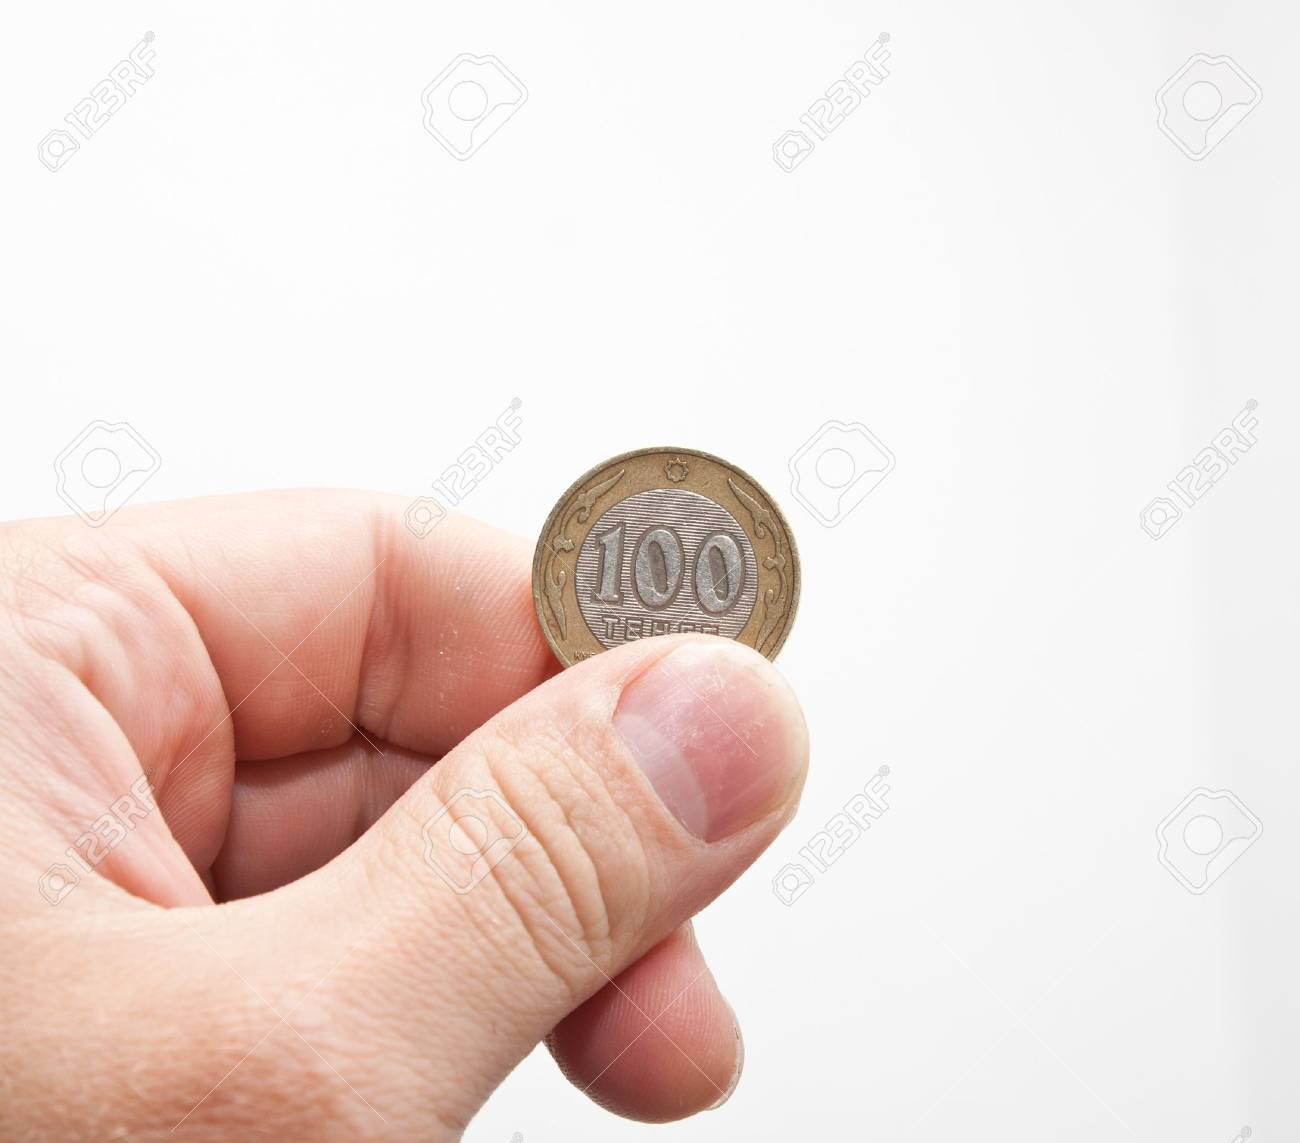 tenge in hand on white background Stock Photo - 14425227